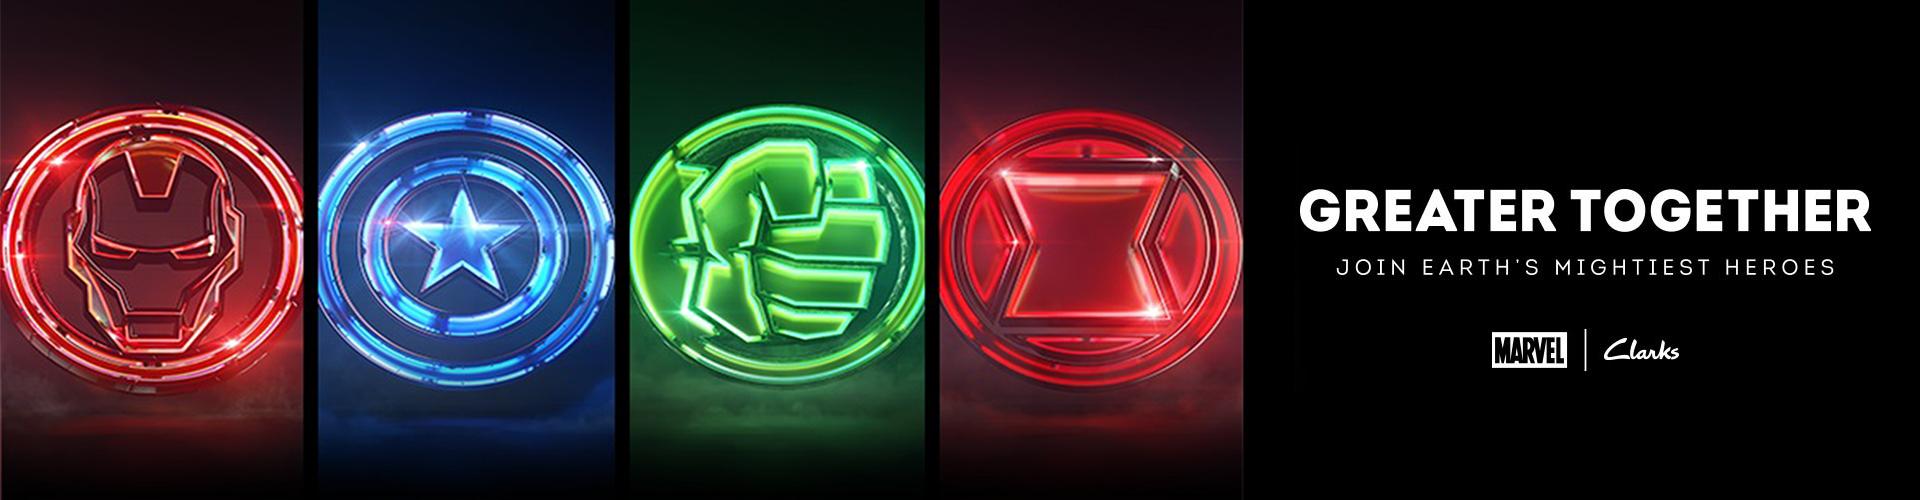 Marvel X Clarks